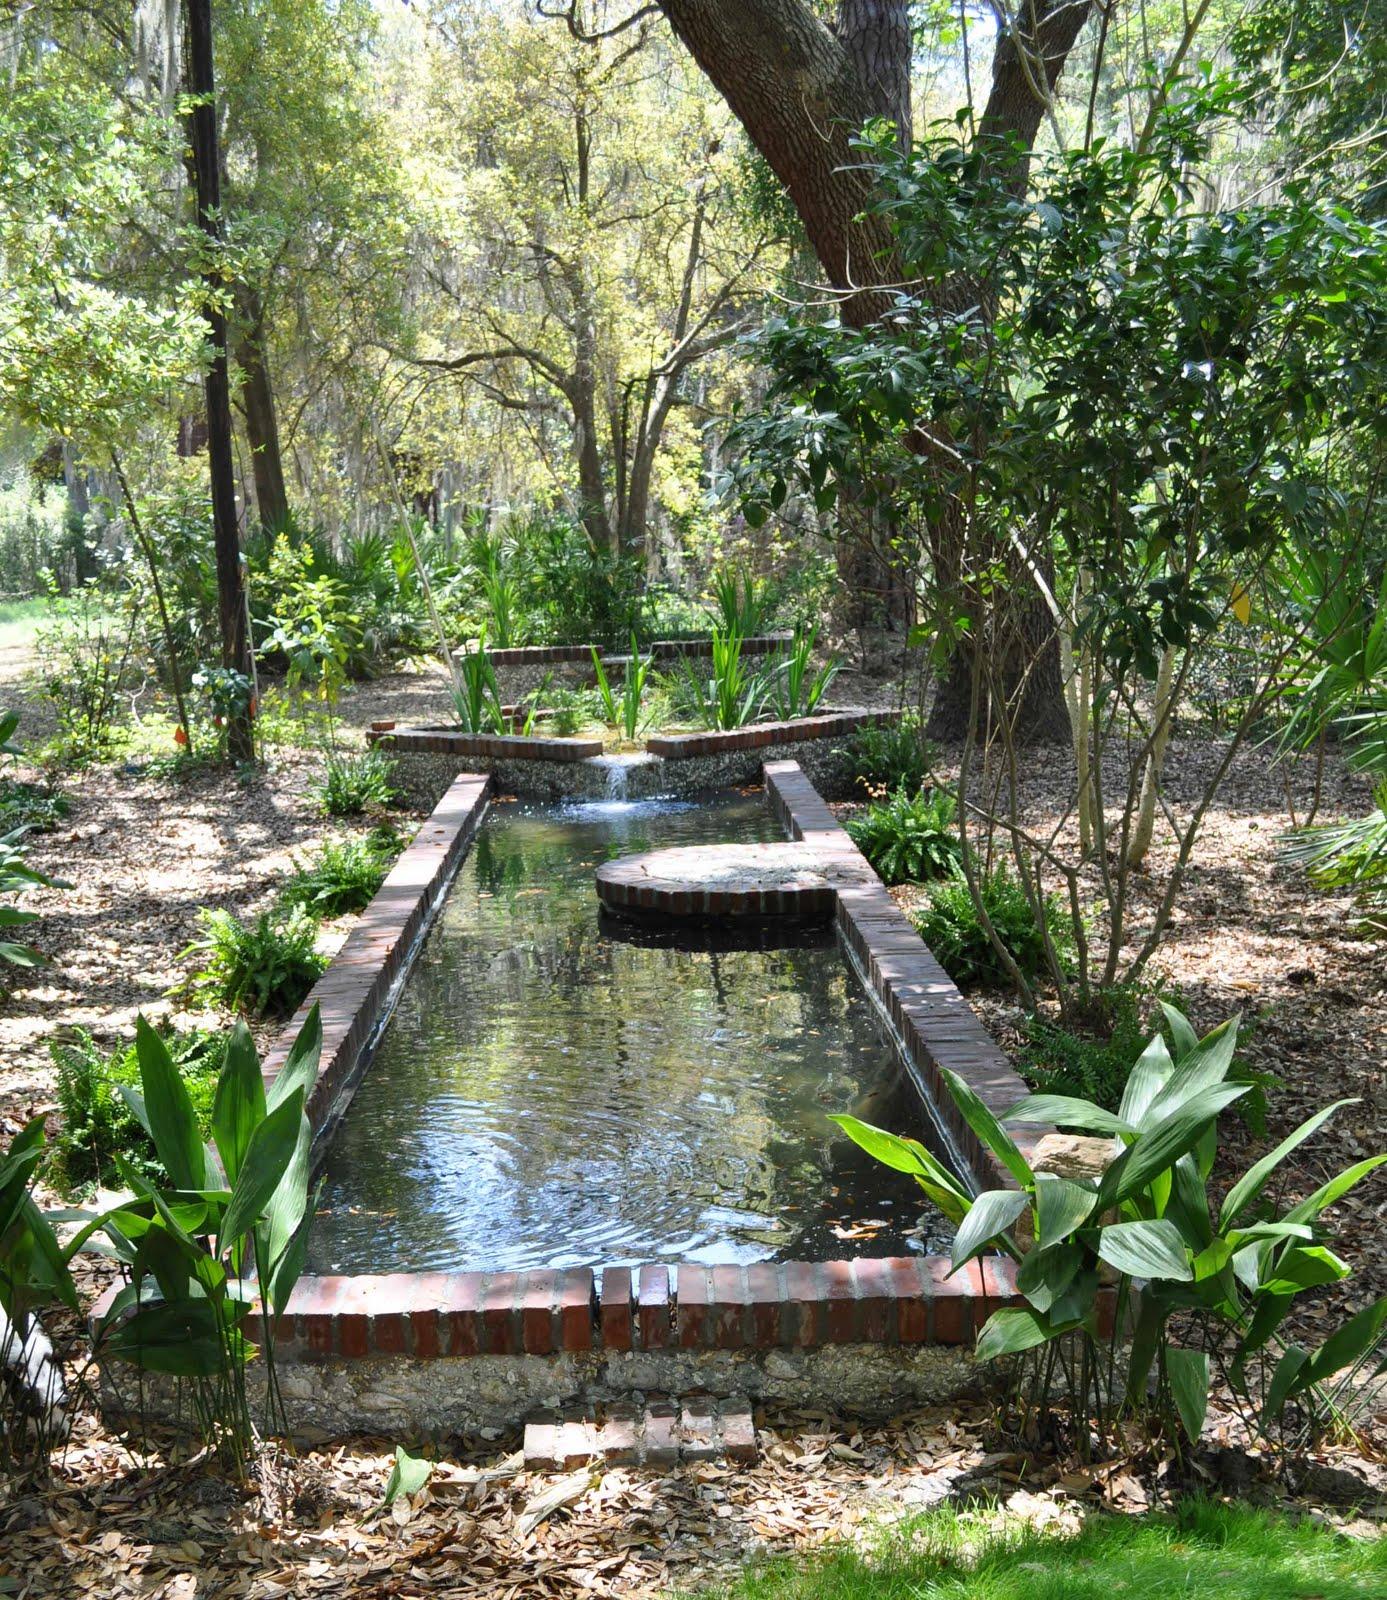 Bog frederick frederick residential architects for Koi pond bog filter